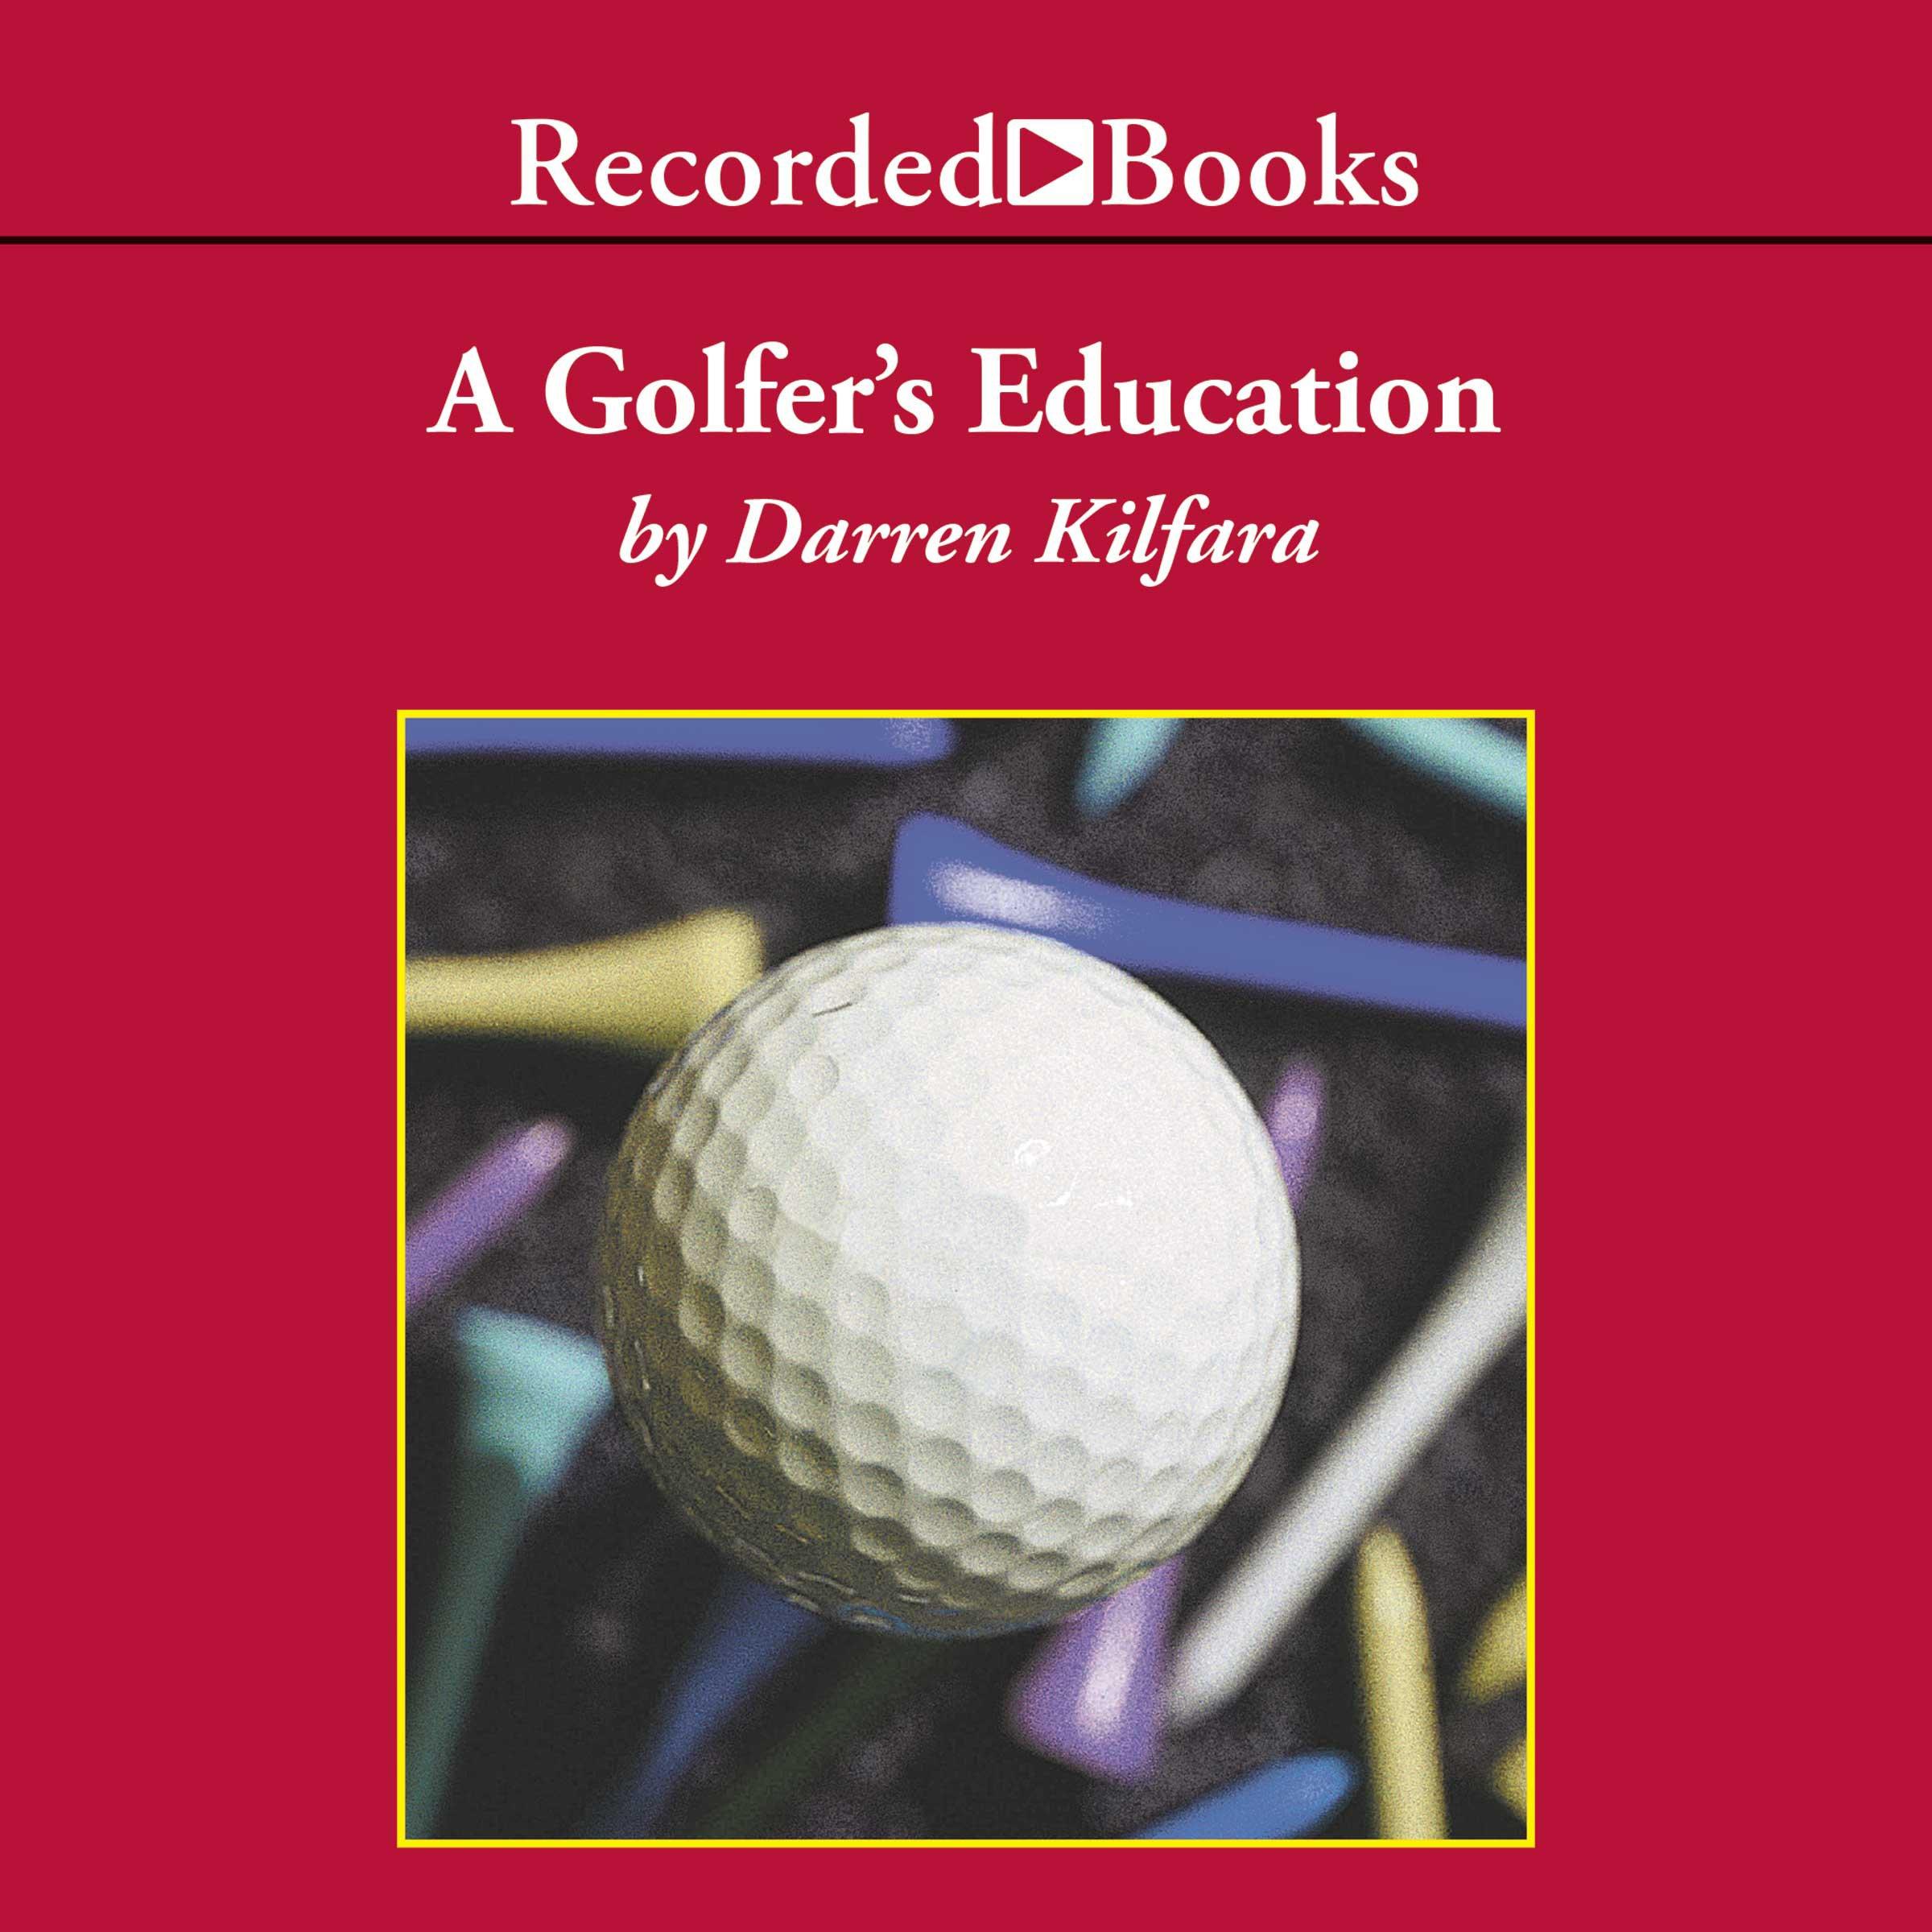 A Golfer's Education